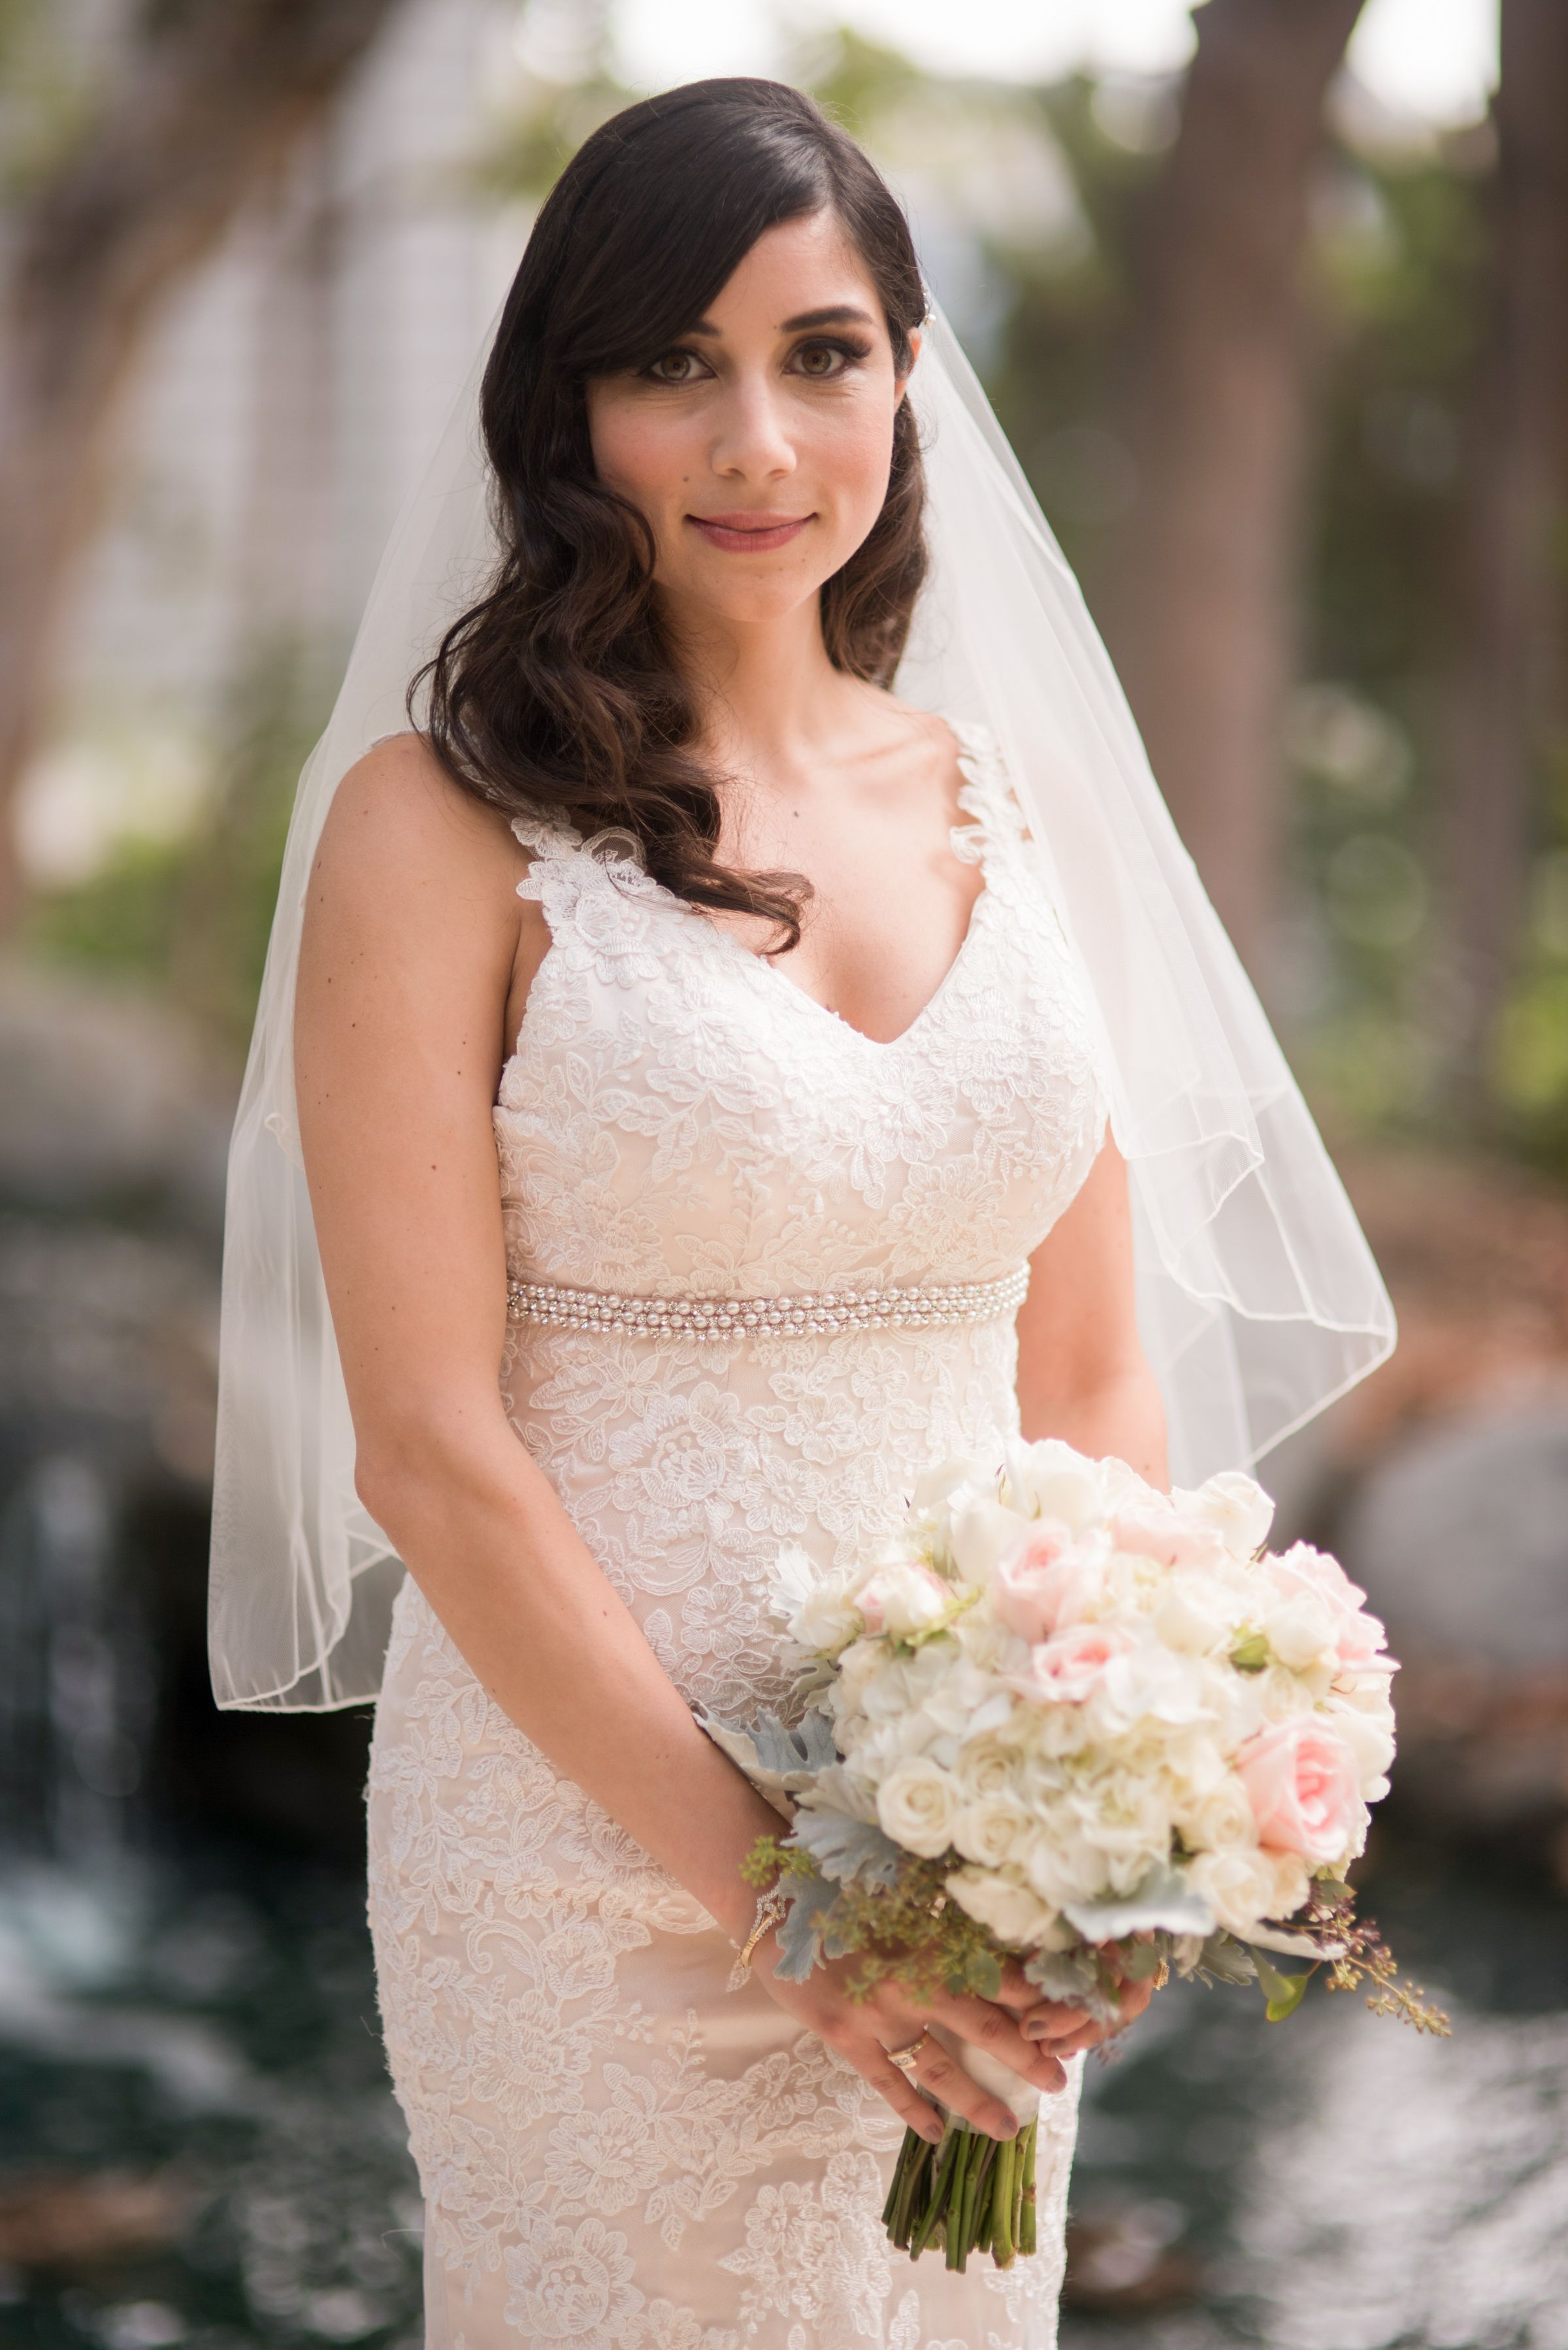 los angeles wedding and bridal hair and makeup artist